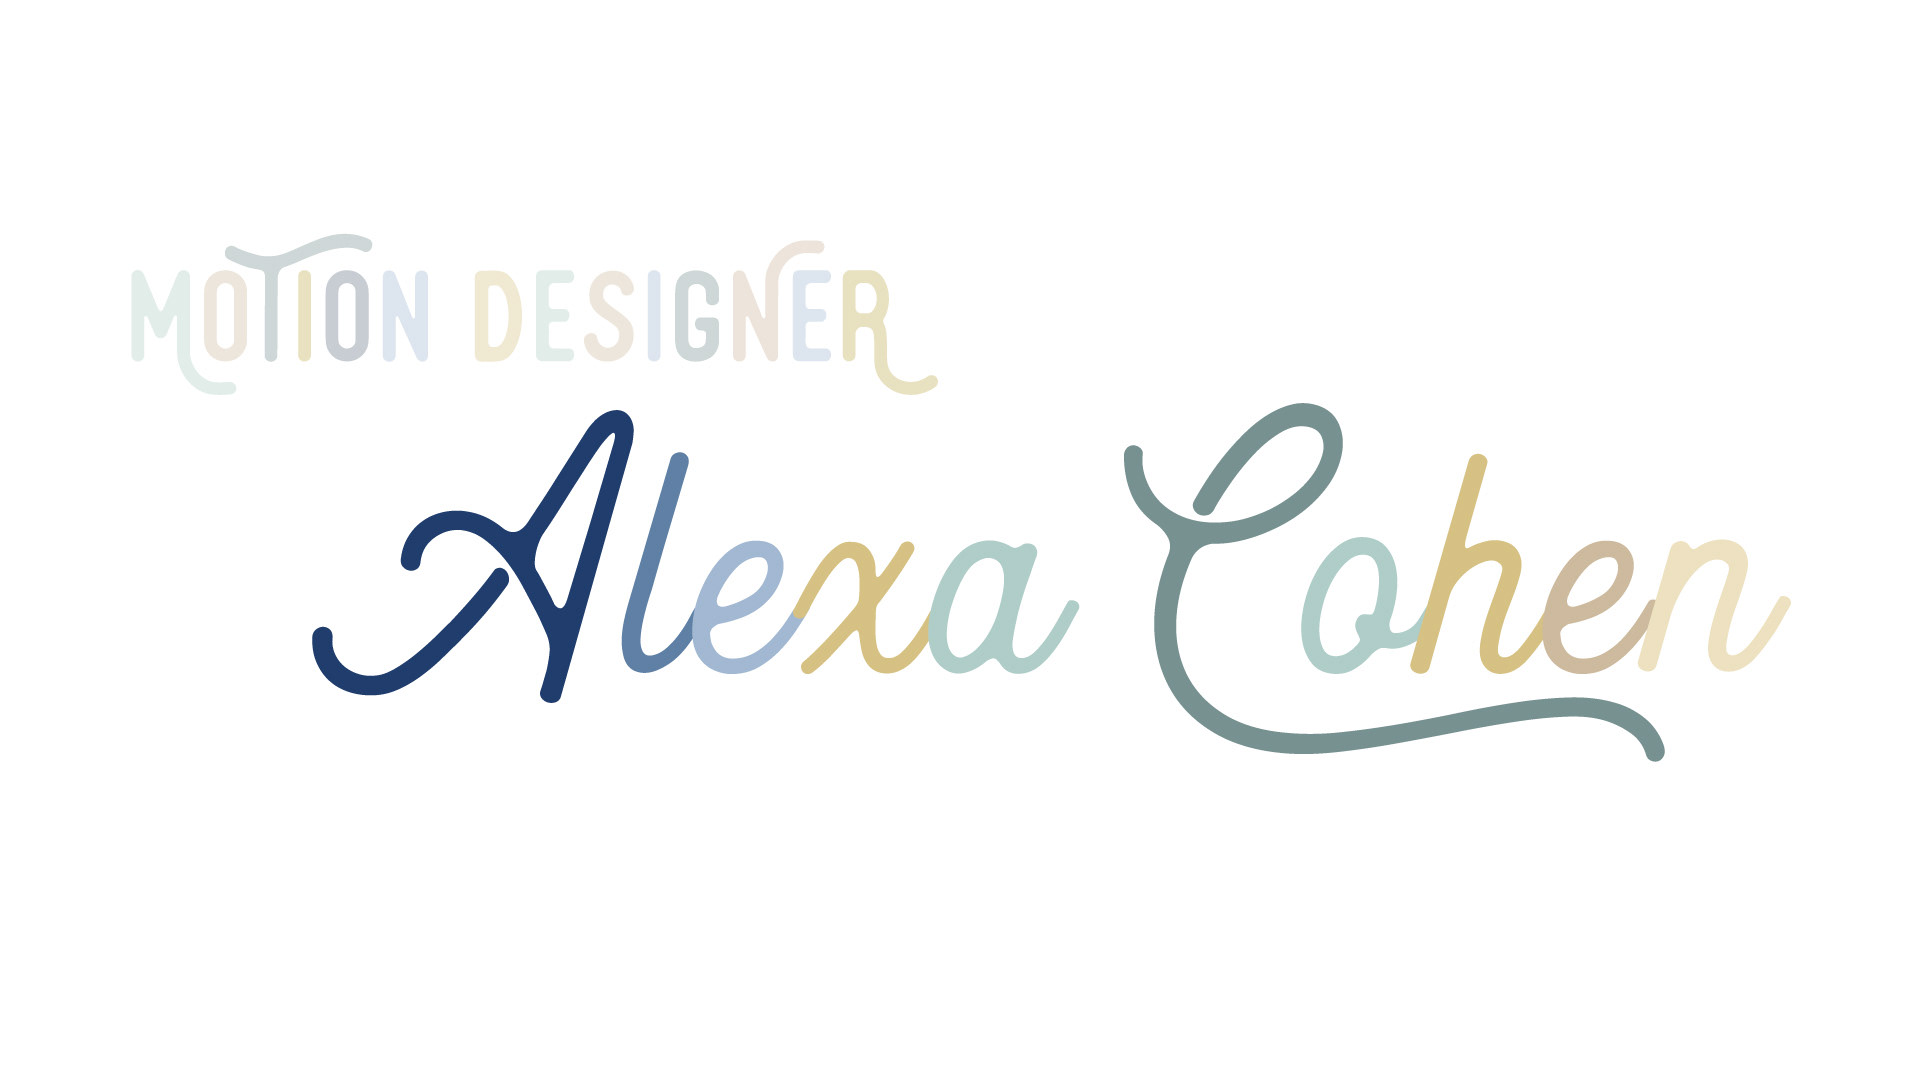 Alexa Cohen